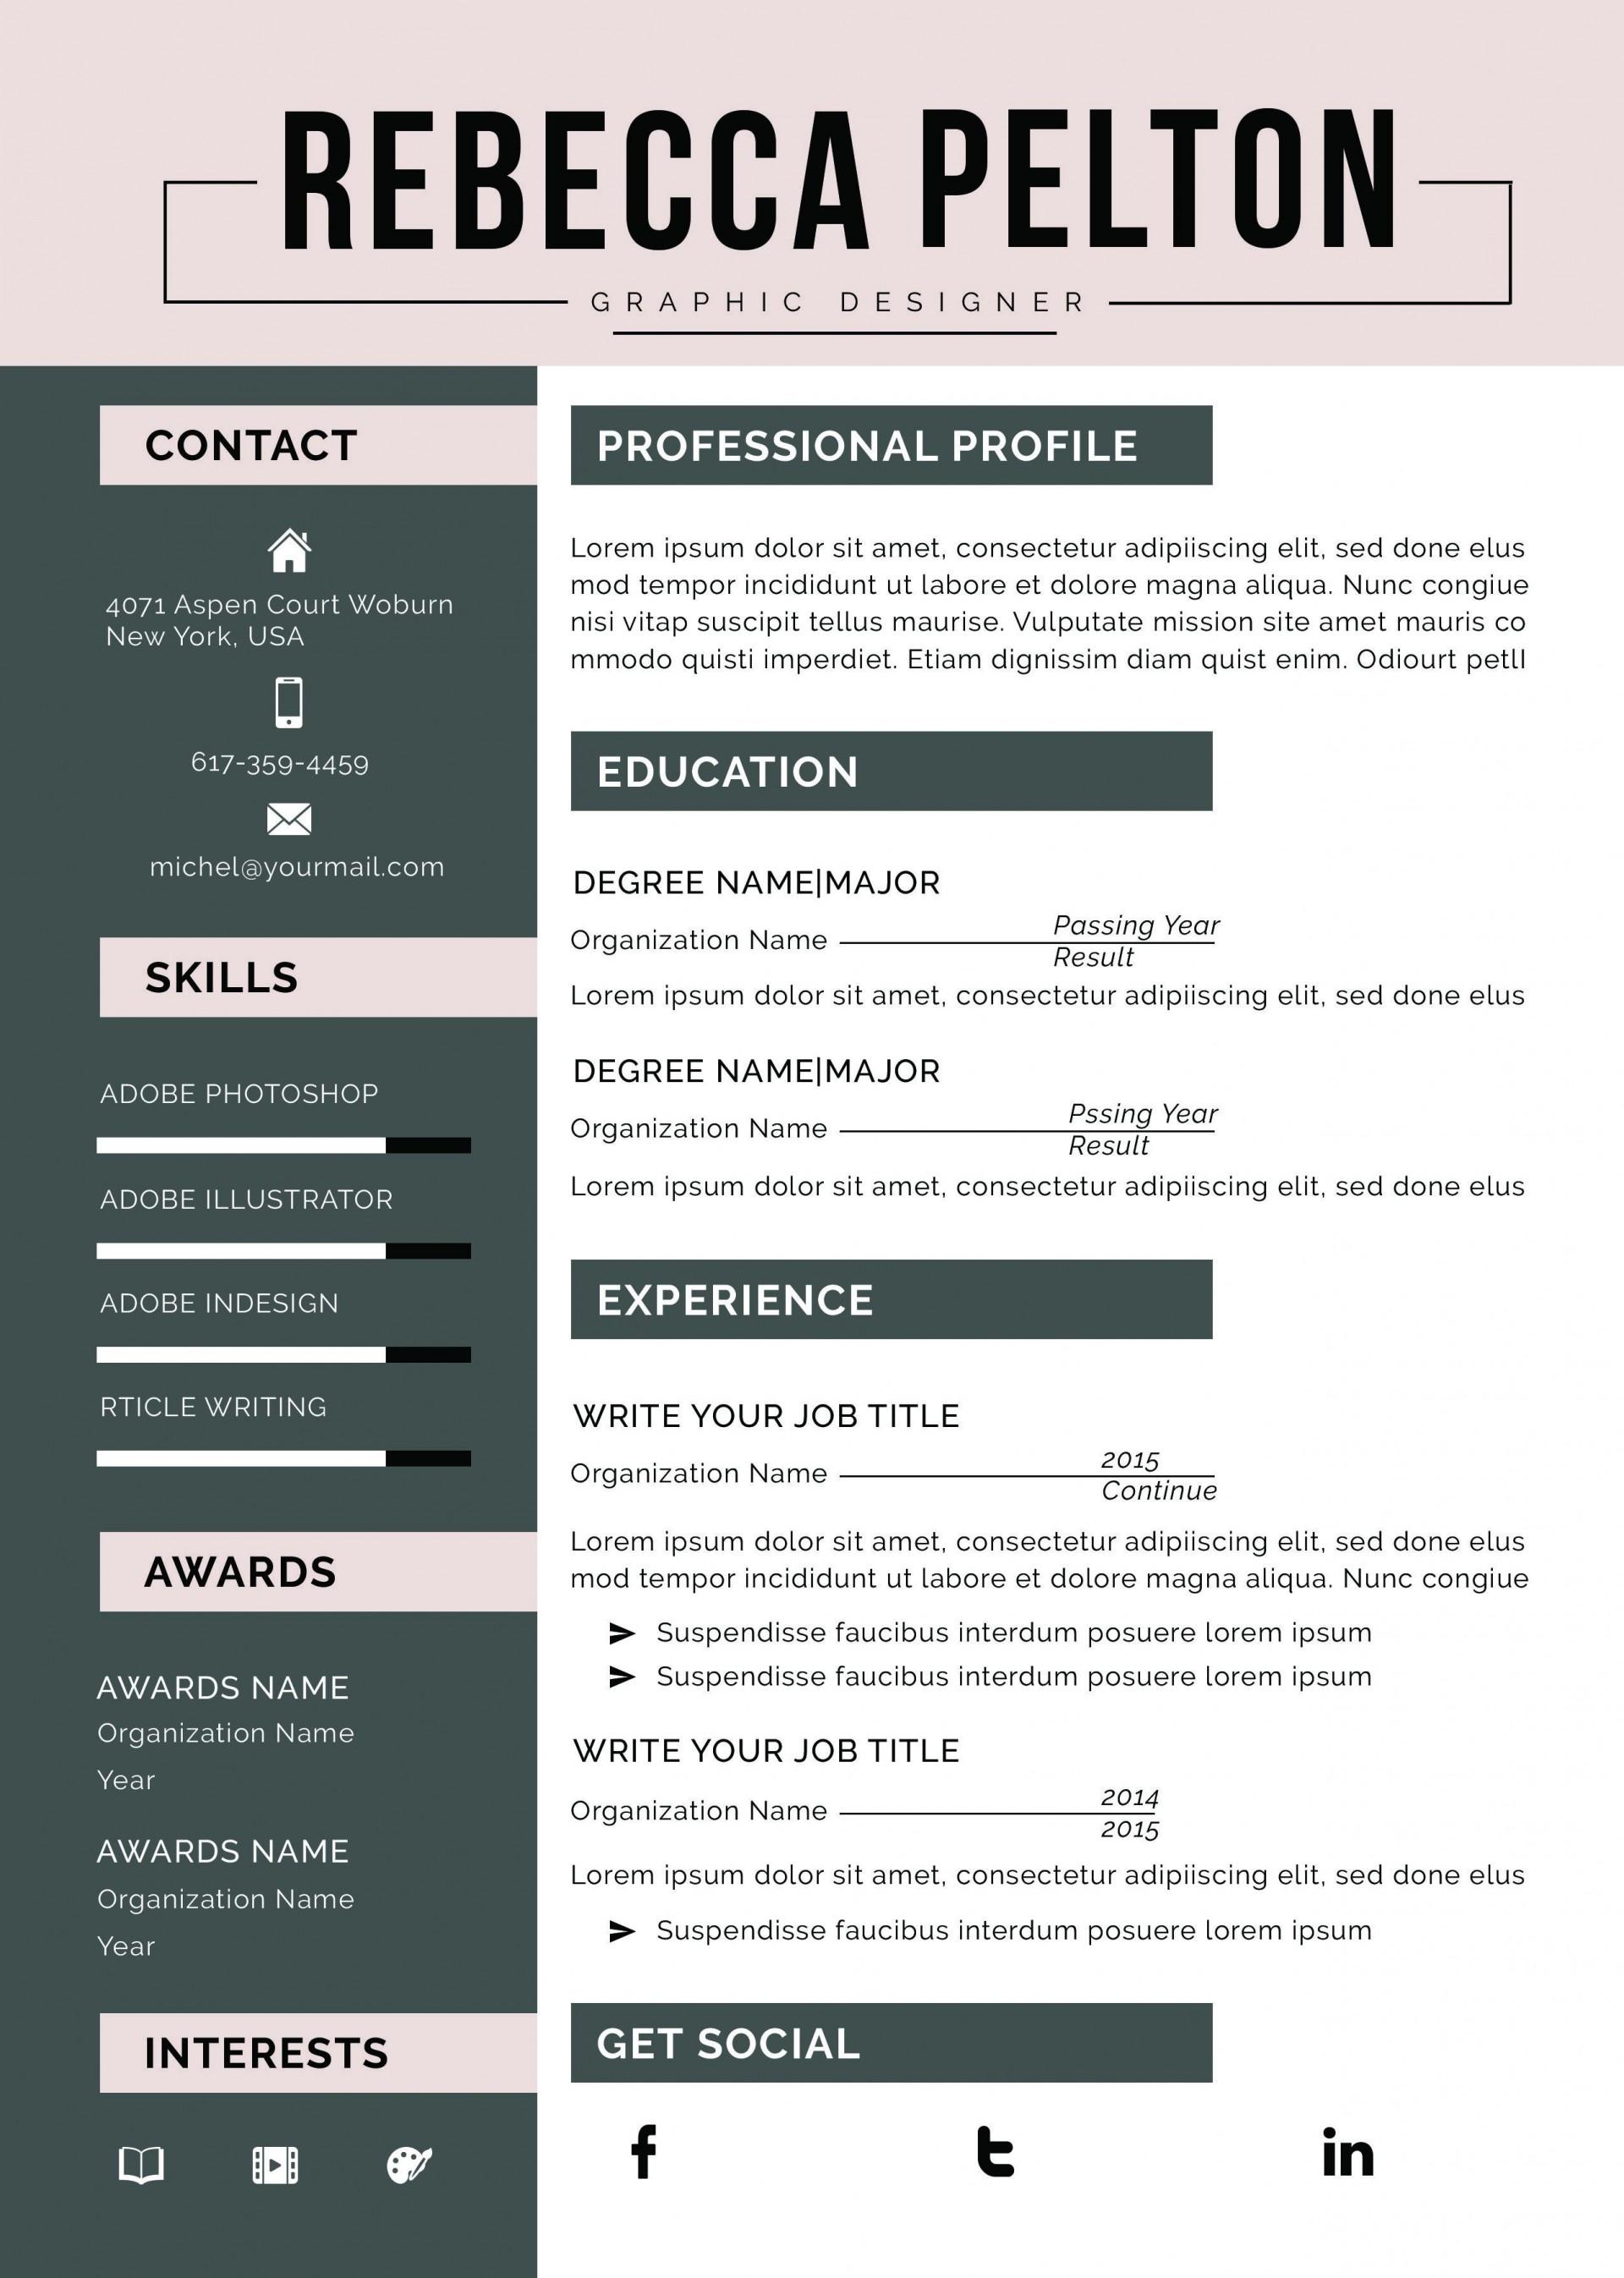 000 Amazing Functional Resume Template Free Image 1920